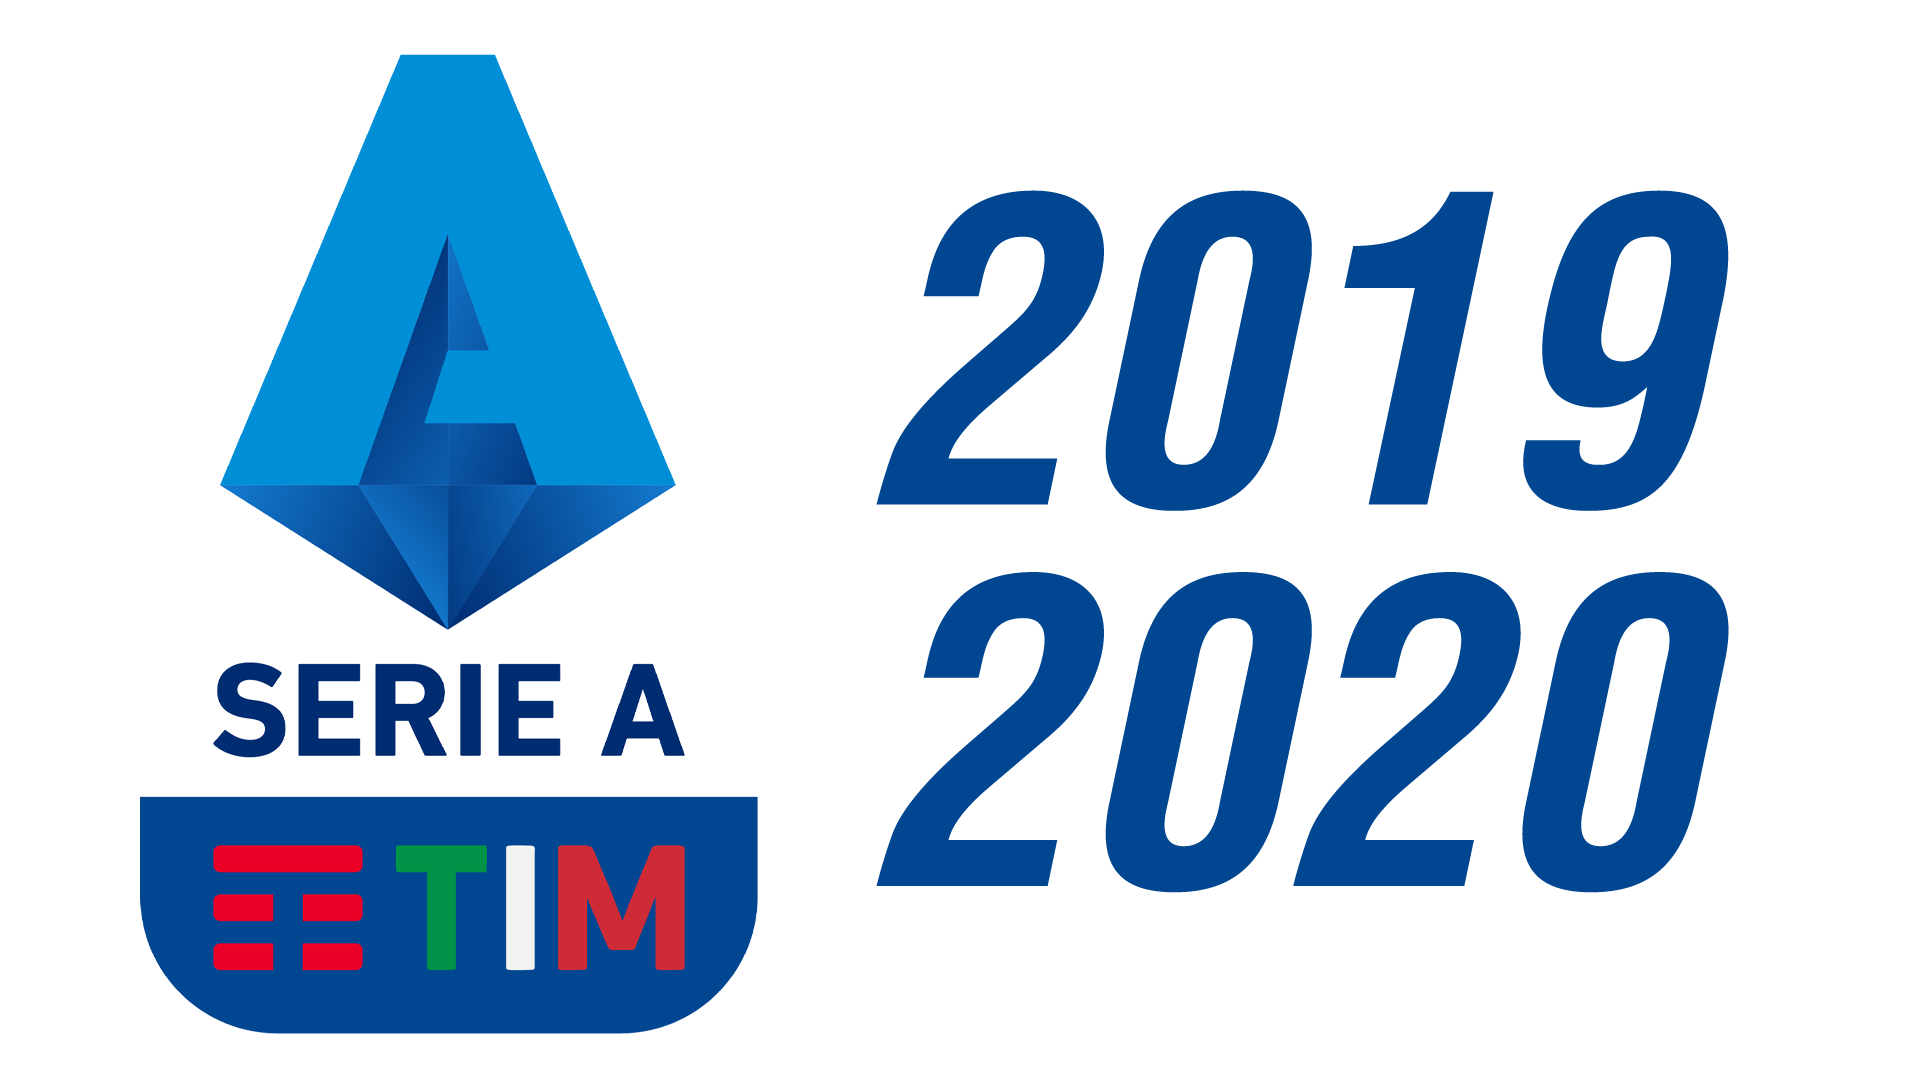 Calendario Partite Serie A 2020 2020.Calendario Serie A 2019 2020 Quando E Dove Vedere Le